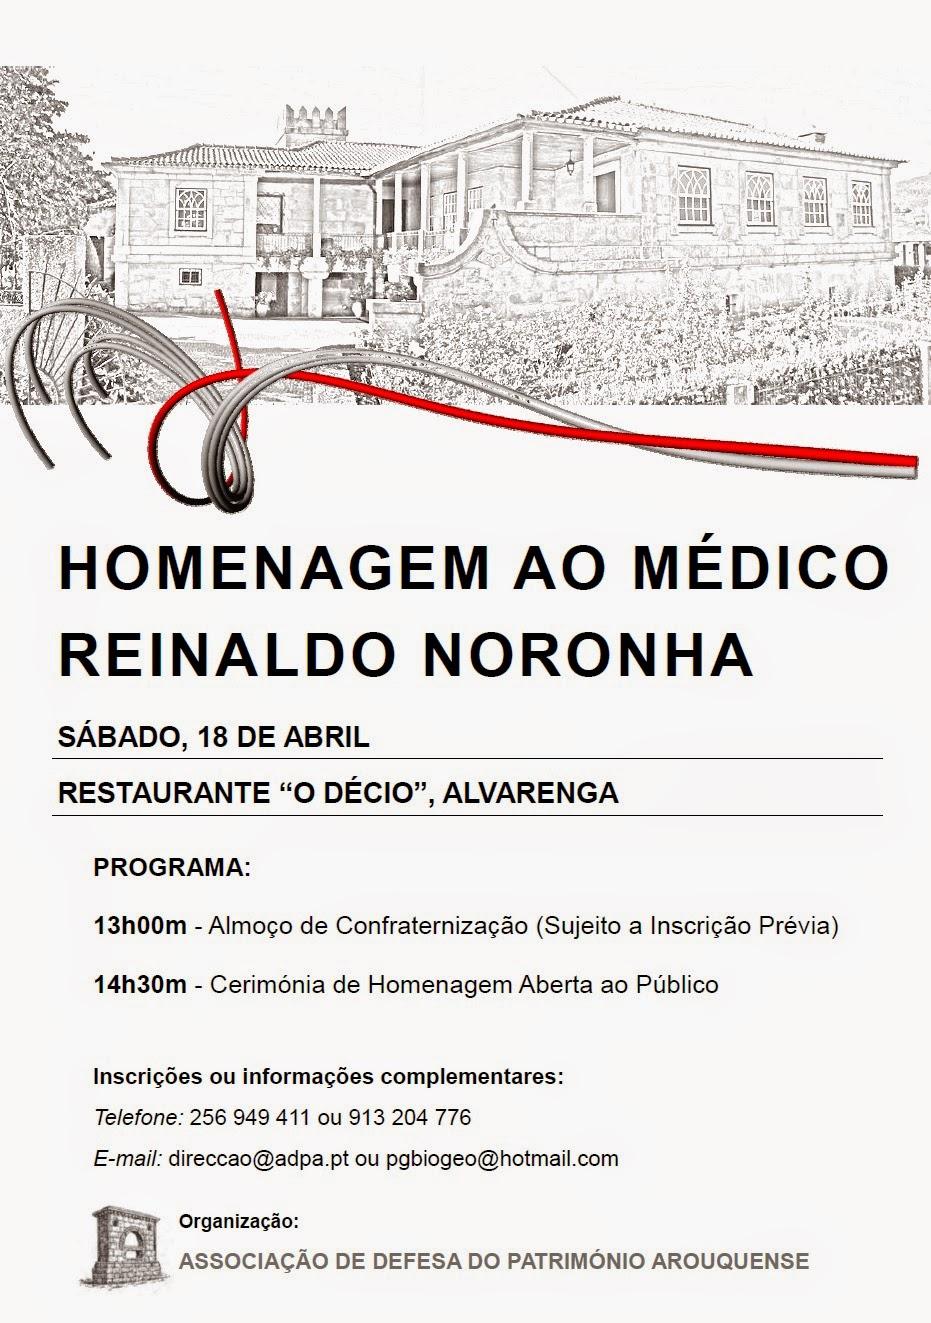 https://reinaldonoronha.wordpress.com/